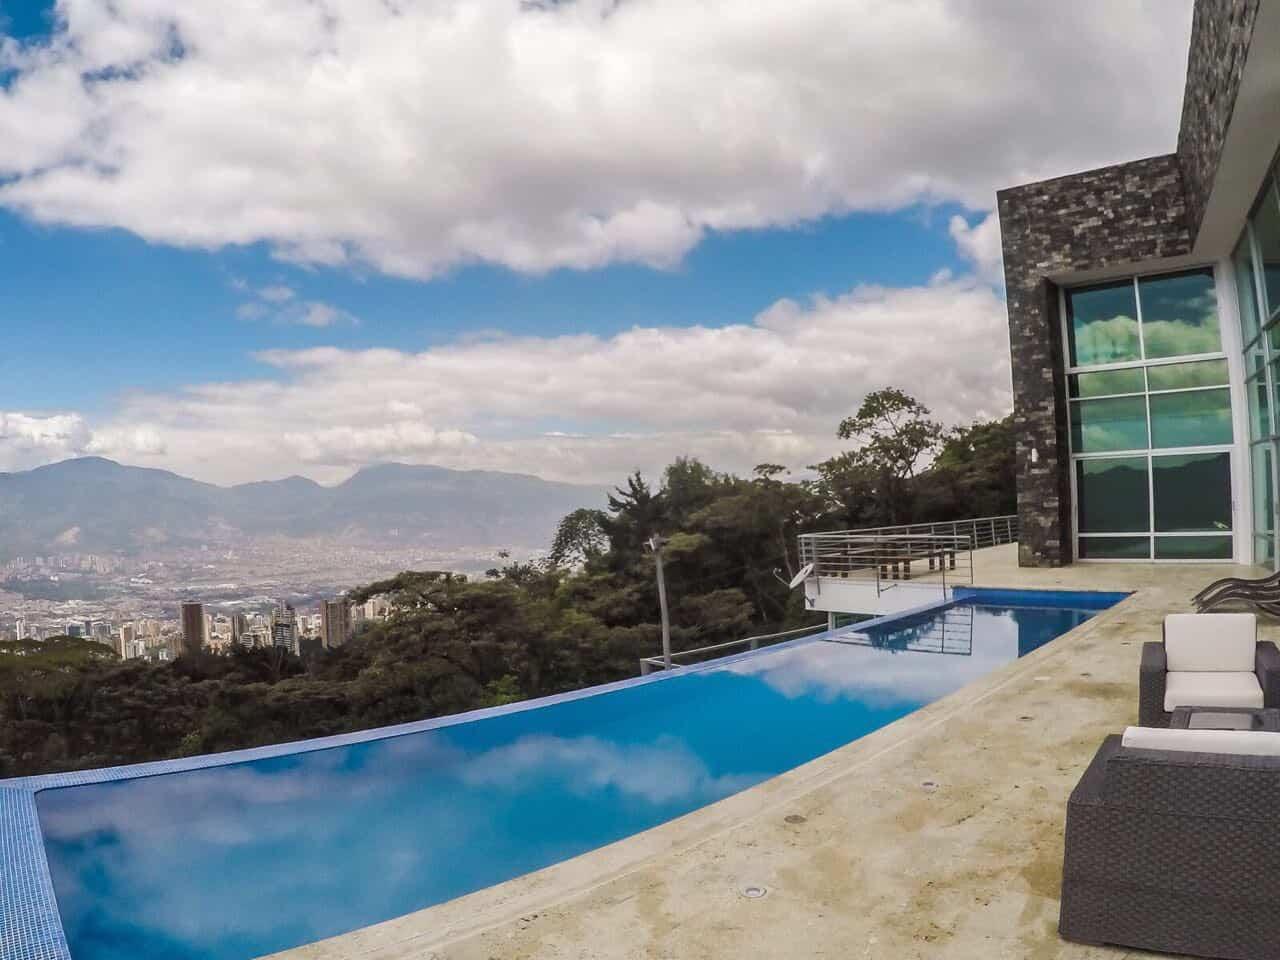 Medellin Apartments: Where to Stay in Medellin